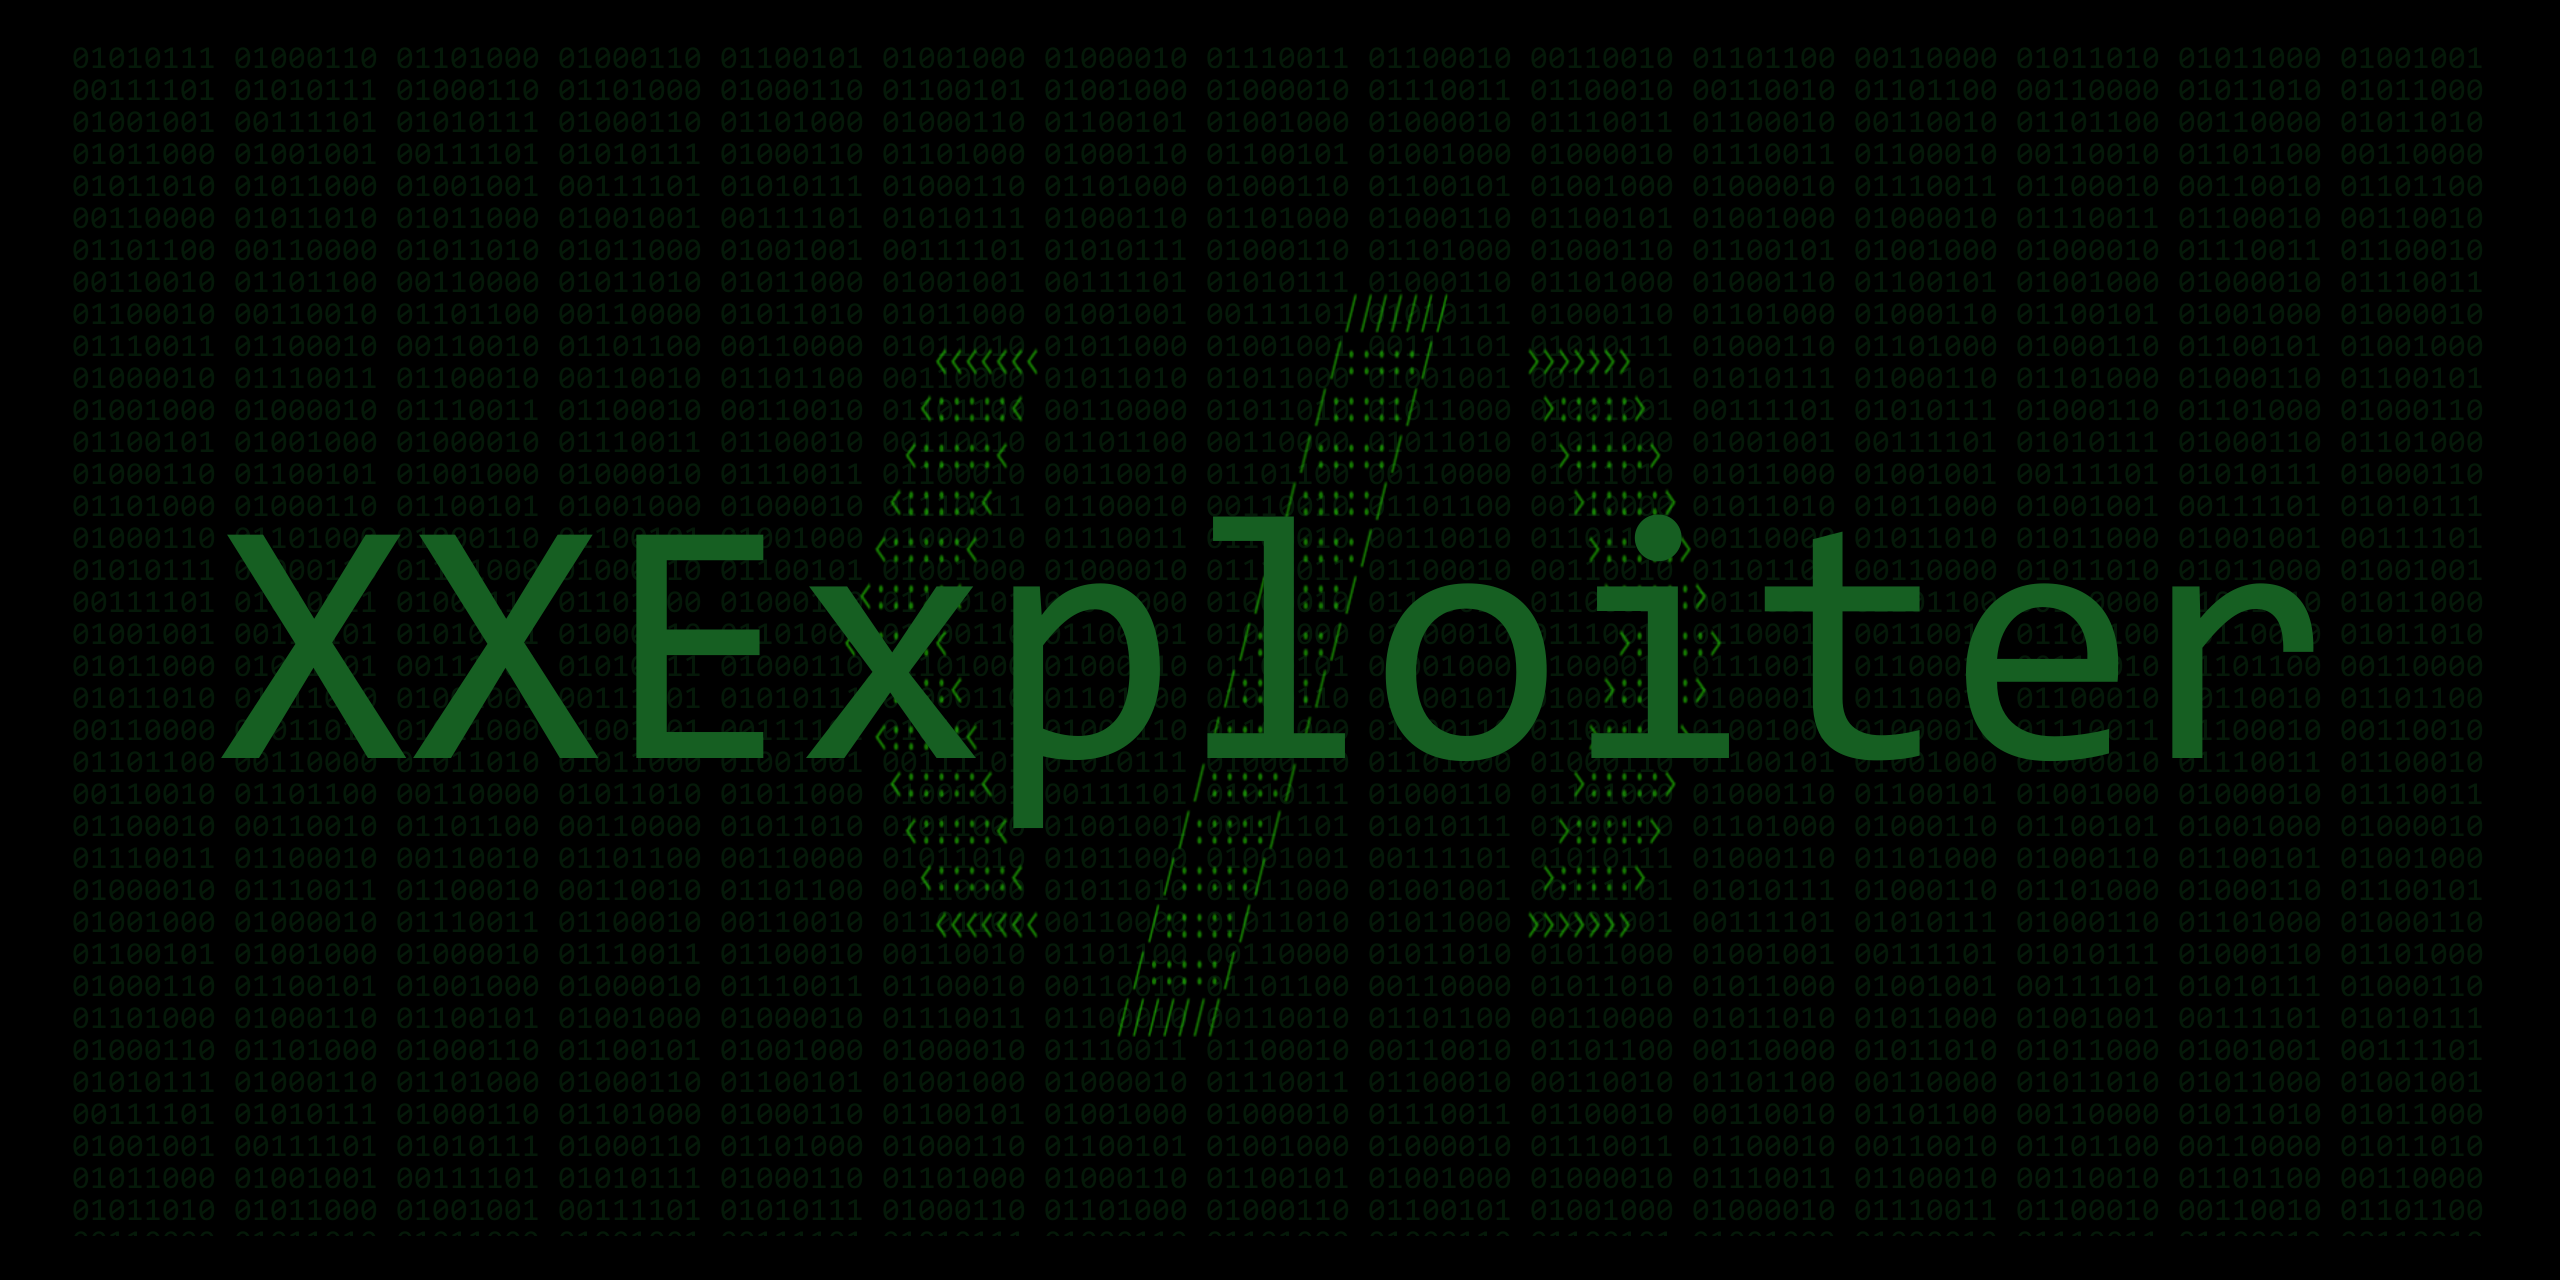 xxexploiter